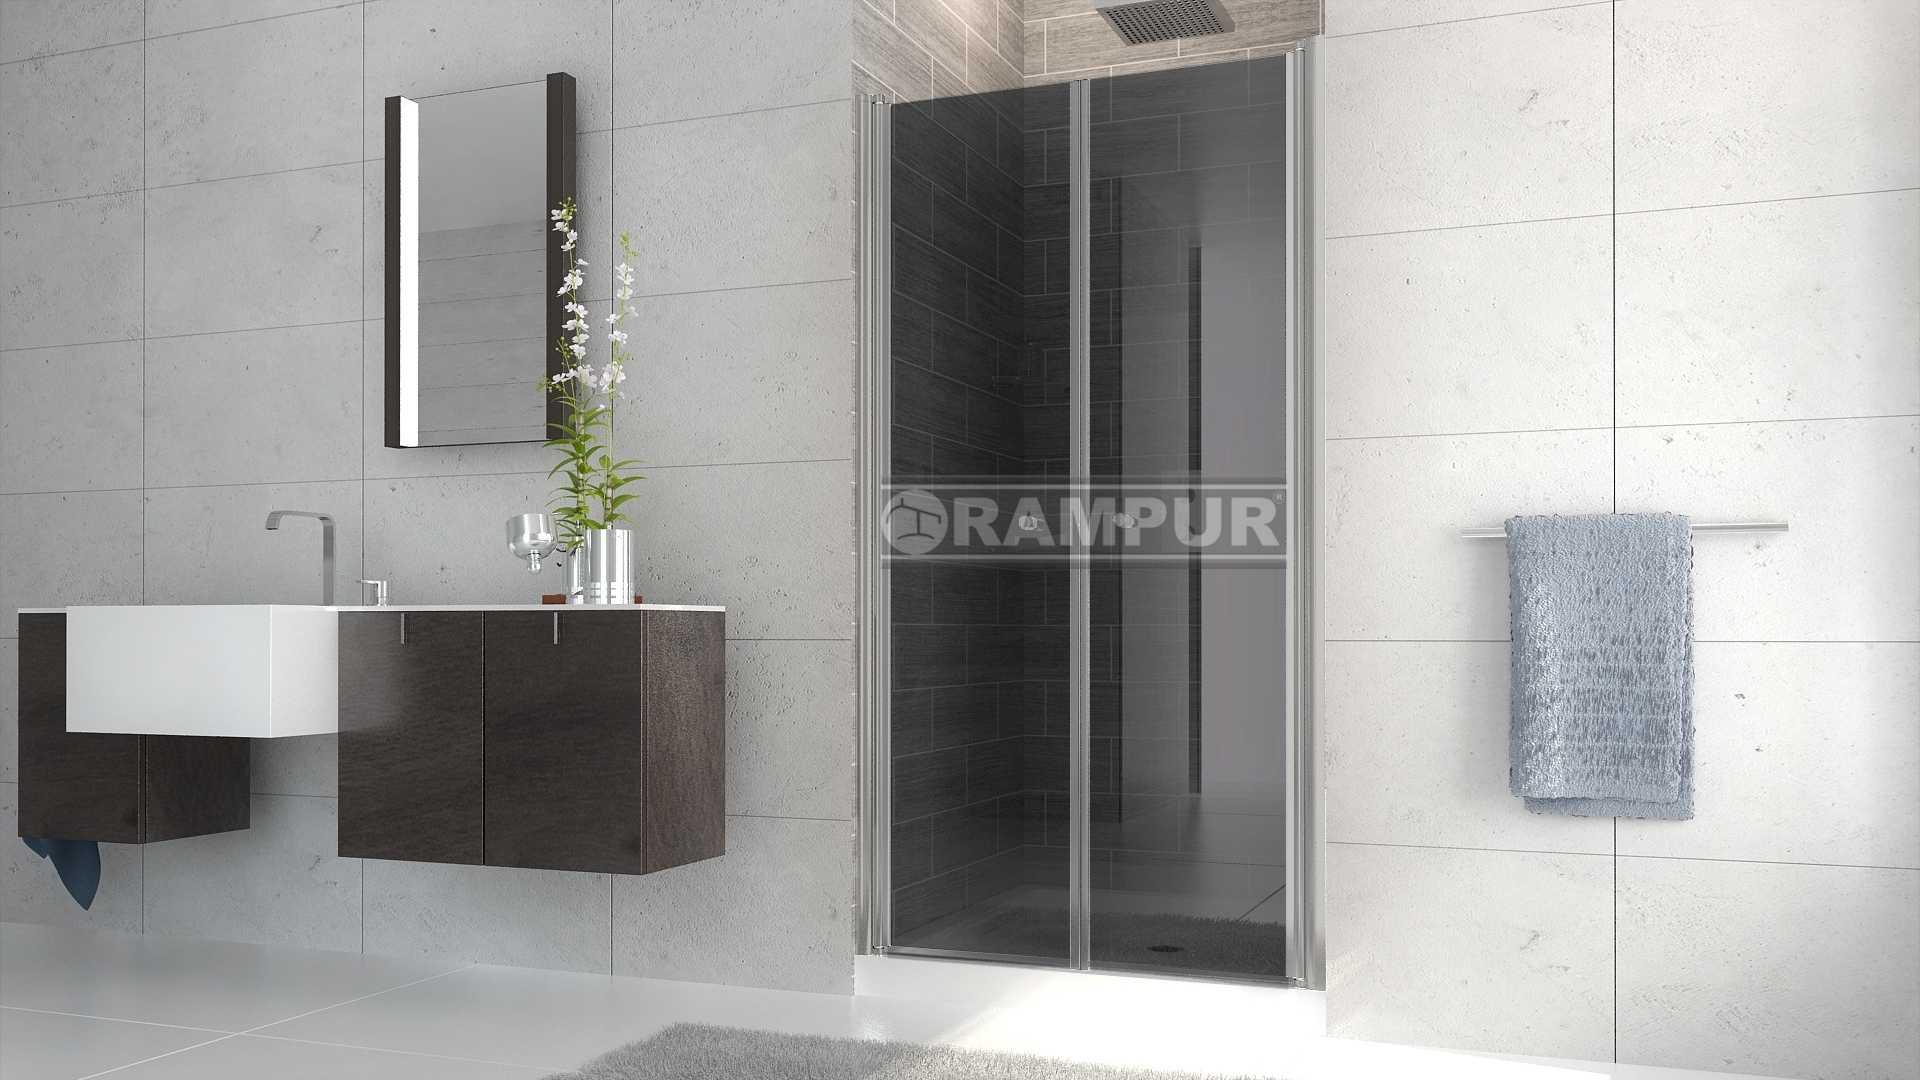 Rampur mamparas para duchas de vidrio atuel premium - Mamparas de vidrio para duchas ...